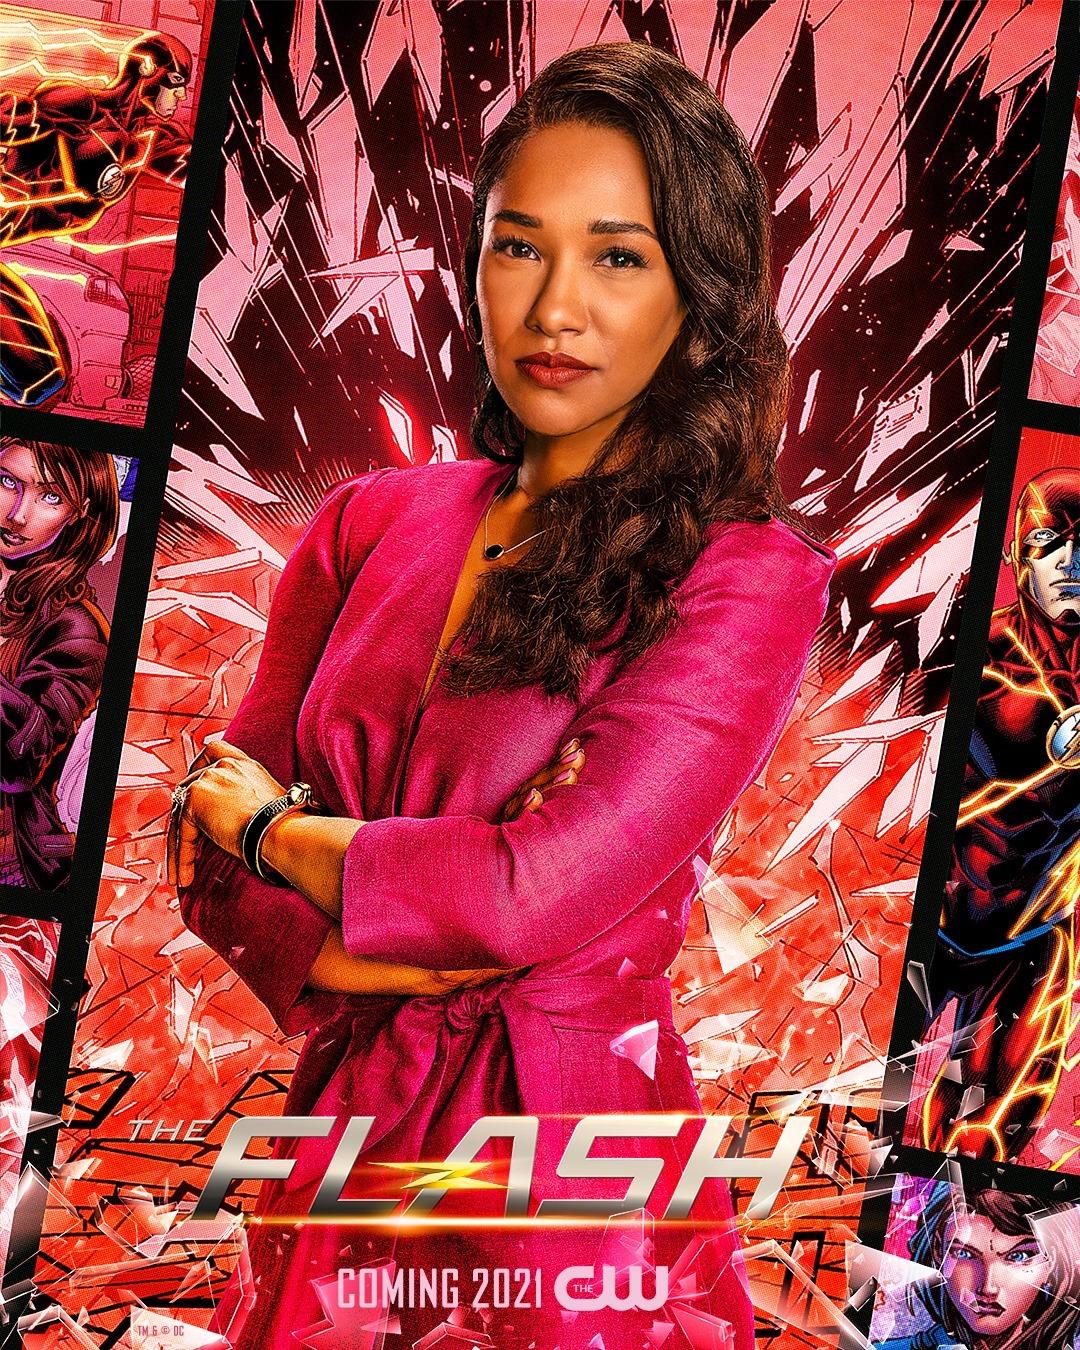 Iris West-Allen (Candice Patton) en un póster promocional de la temporada 7 de The Flash. Imagen: impawards.com